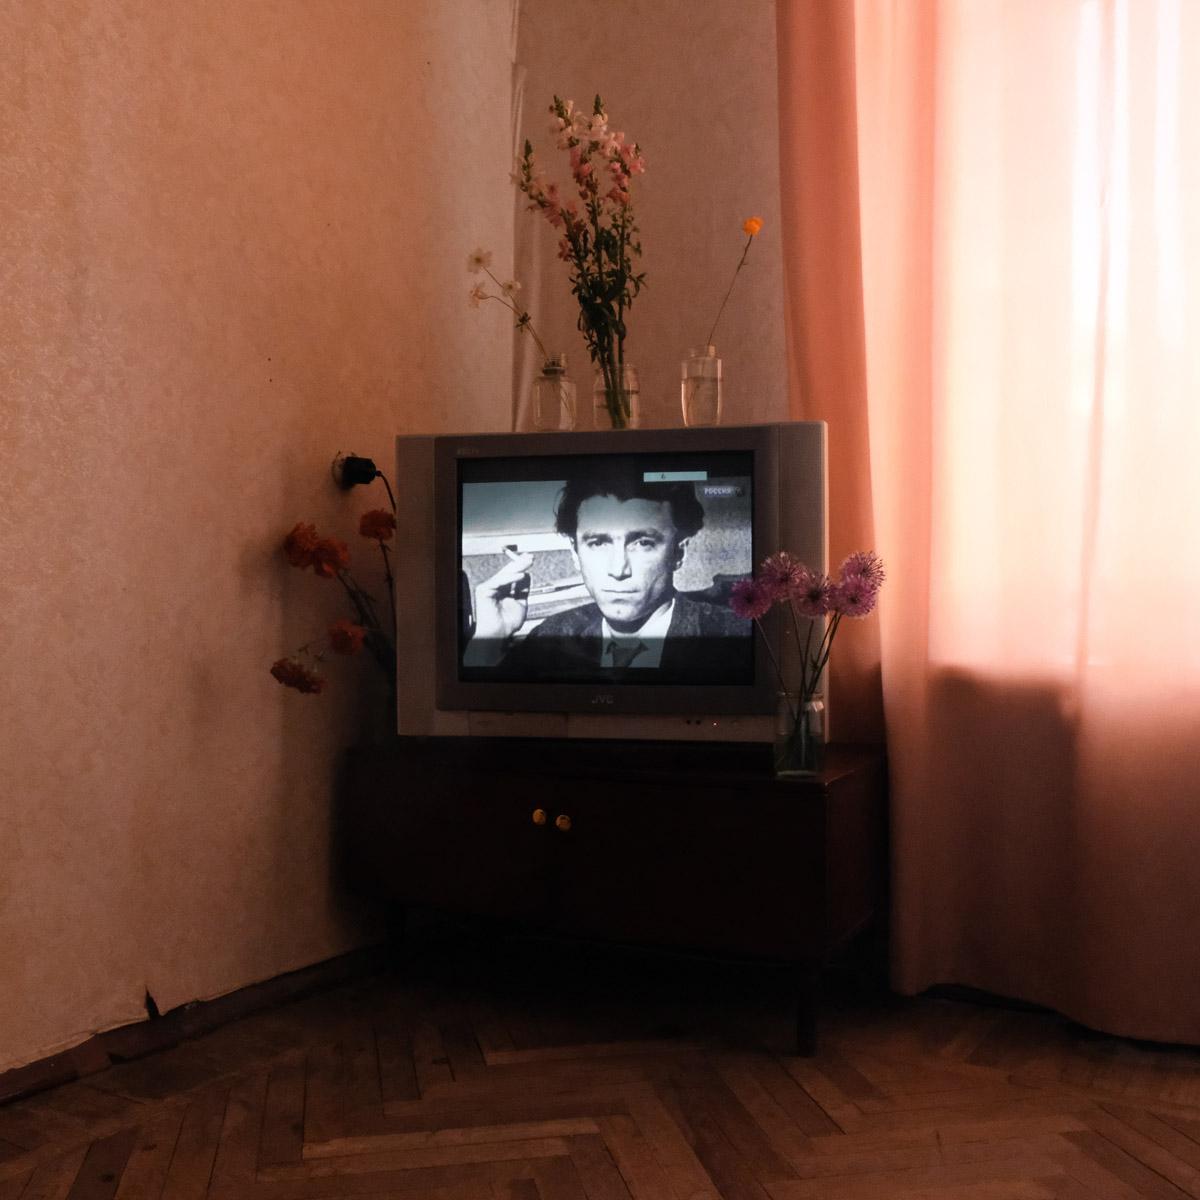 Daria Piskareva The Rudiment 12